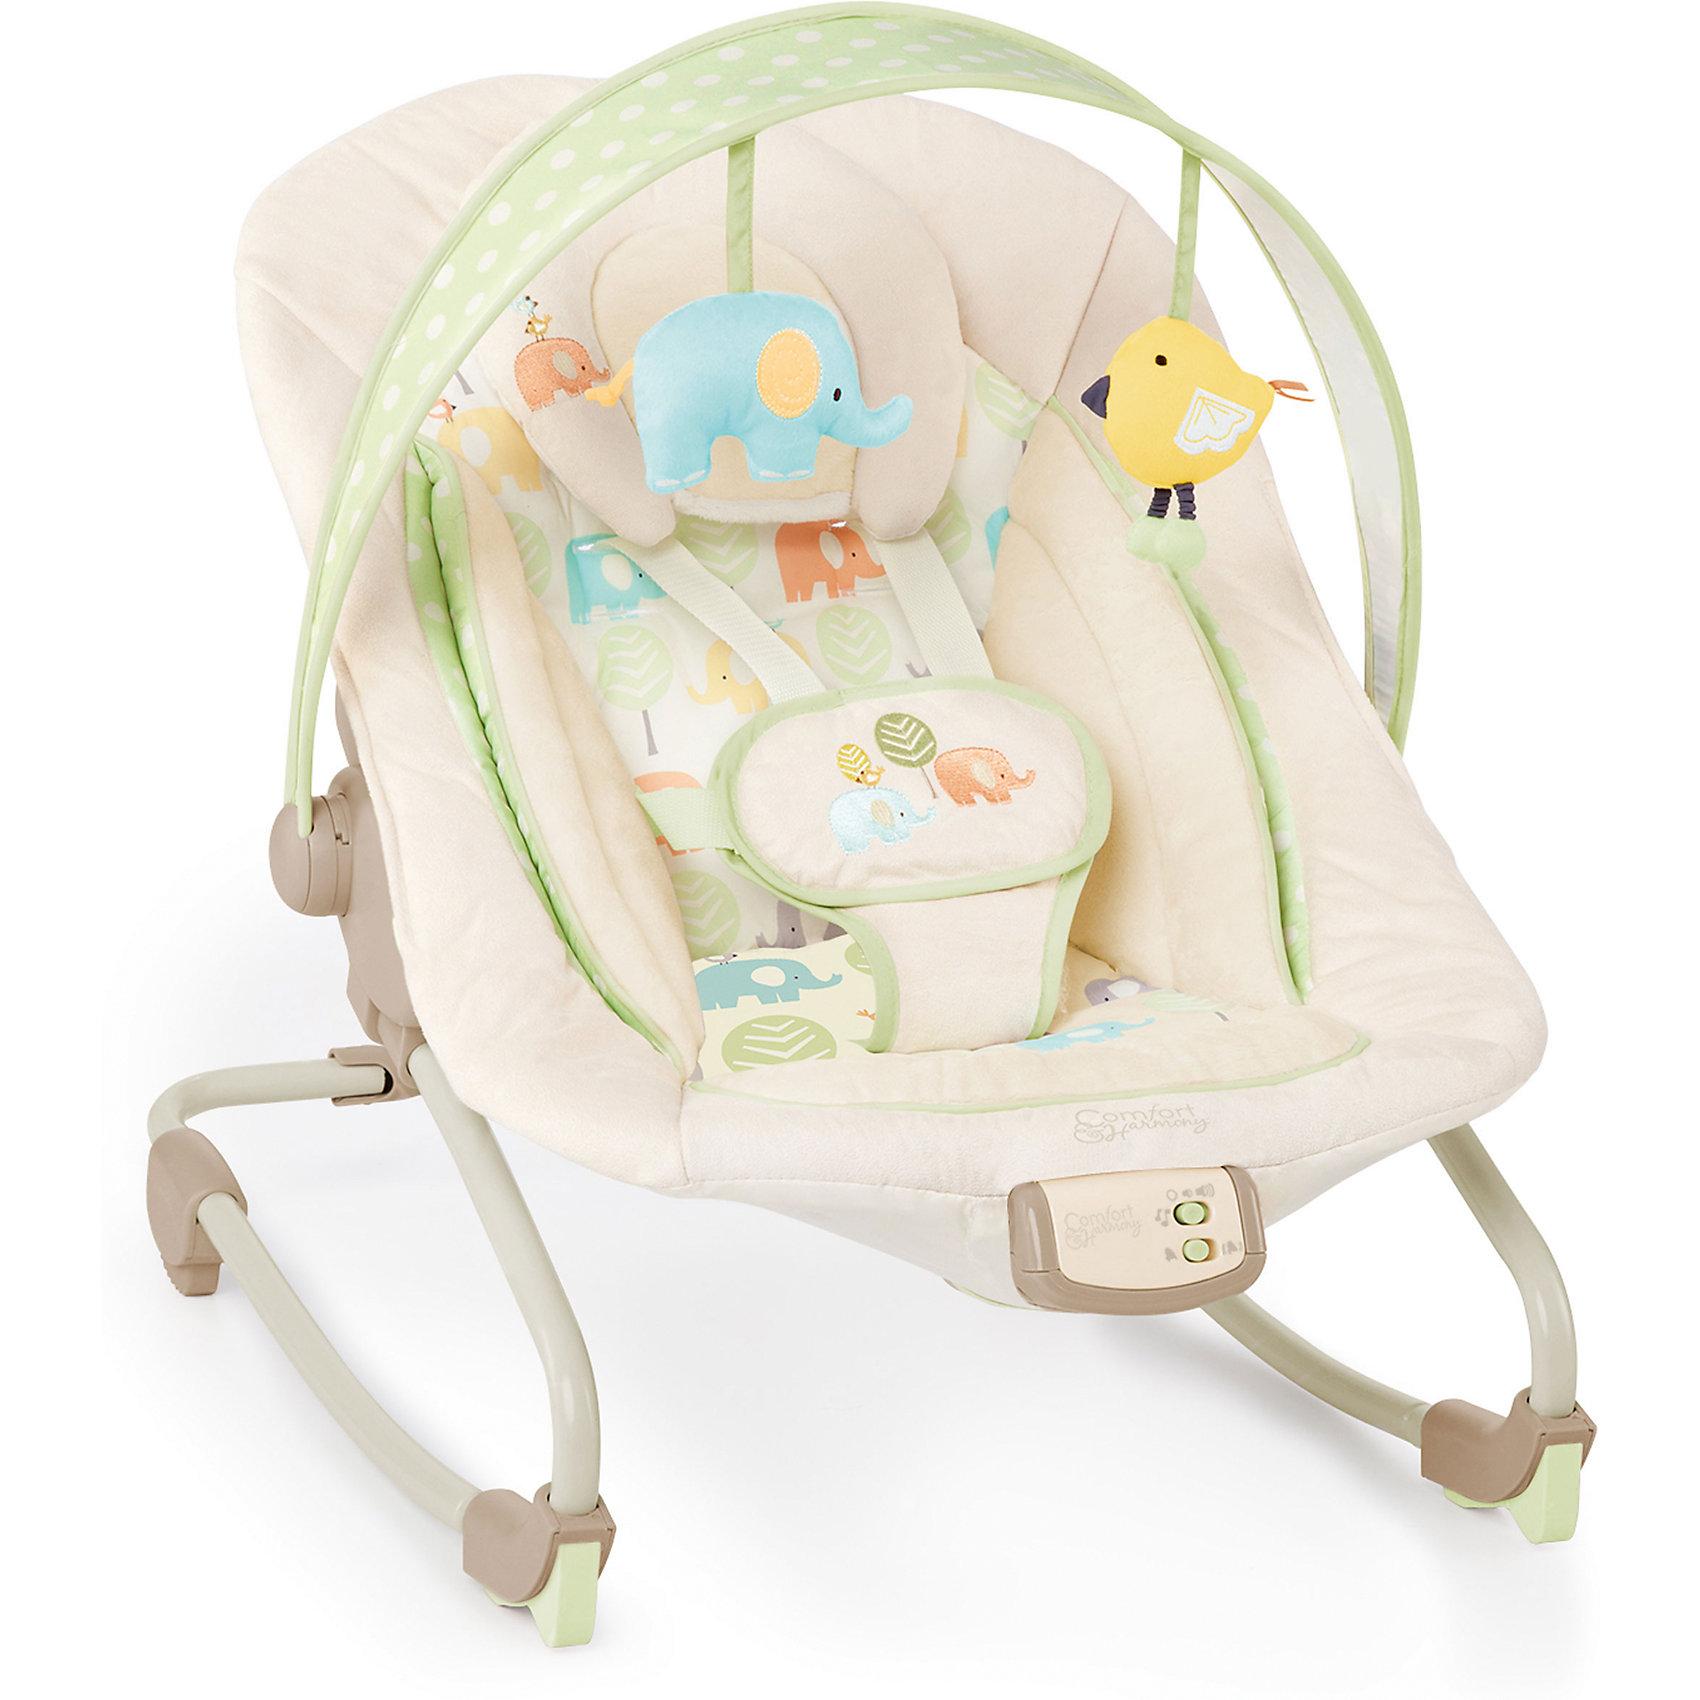 Кресло-качалка  Друзья малыша, Bright Starts